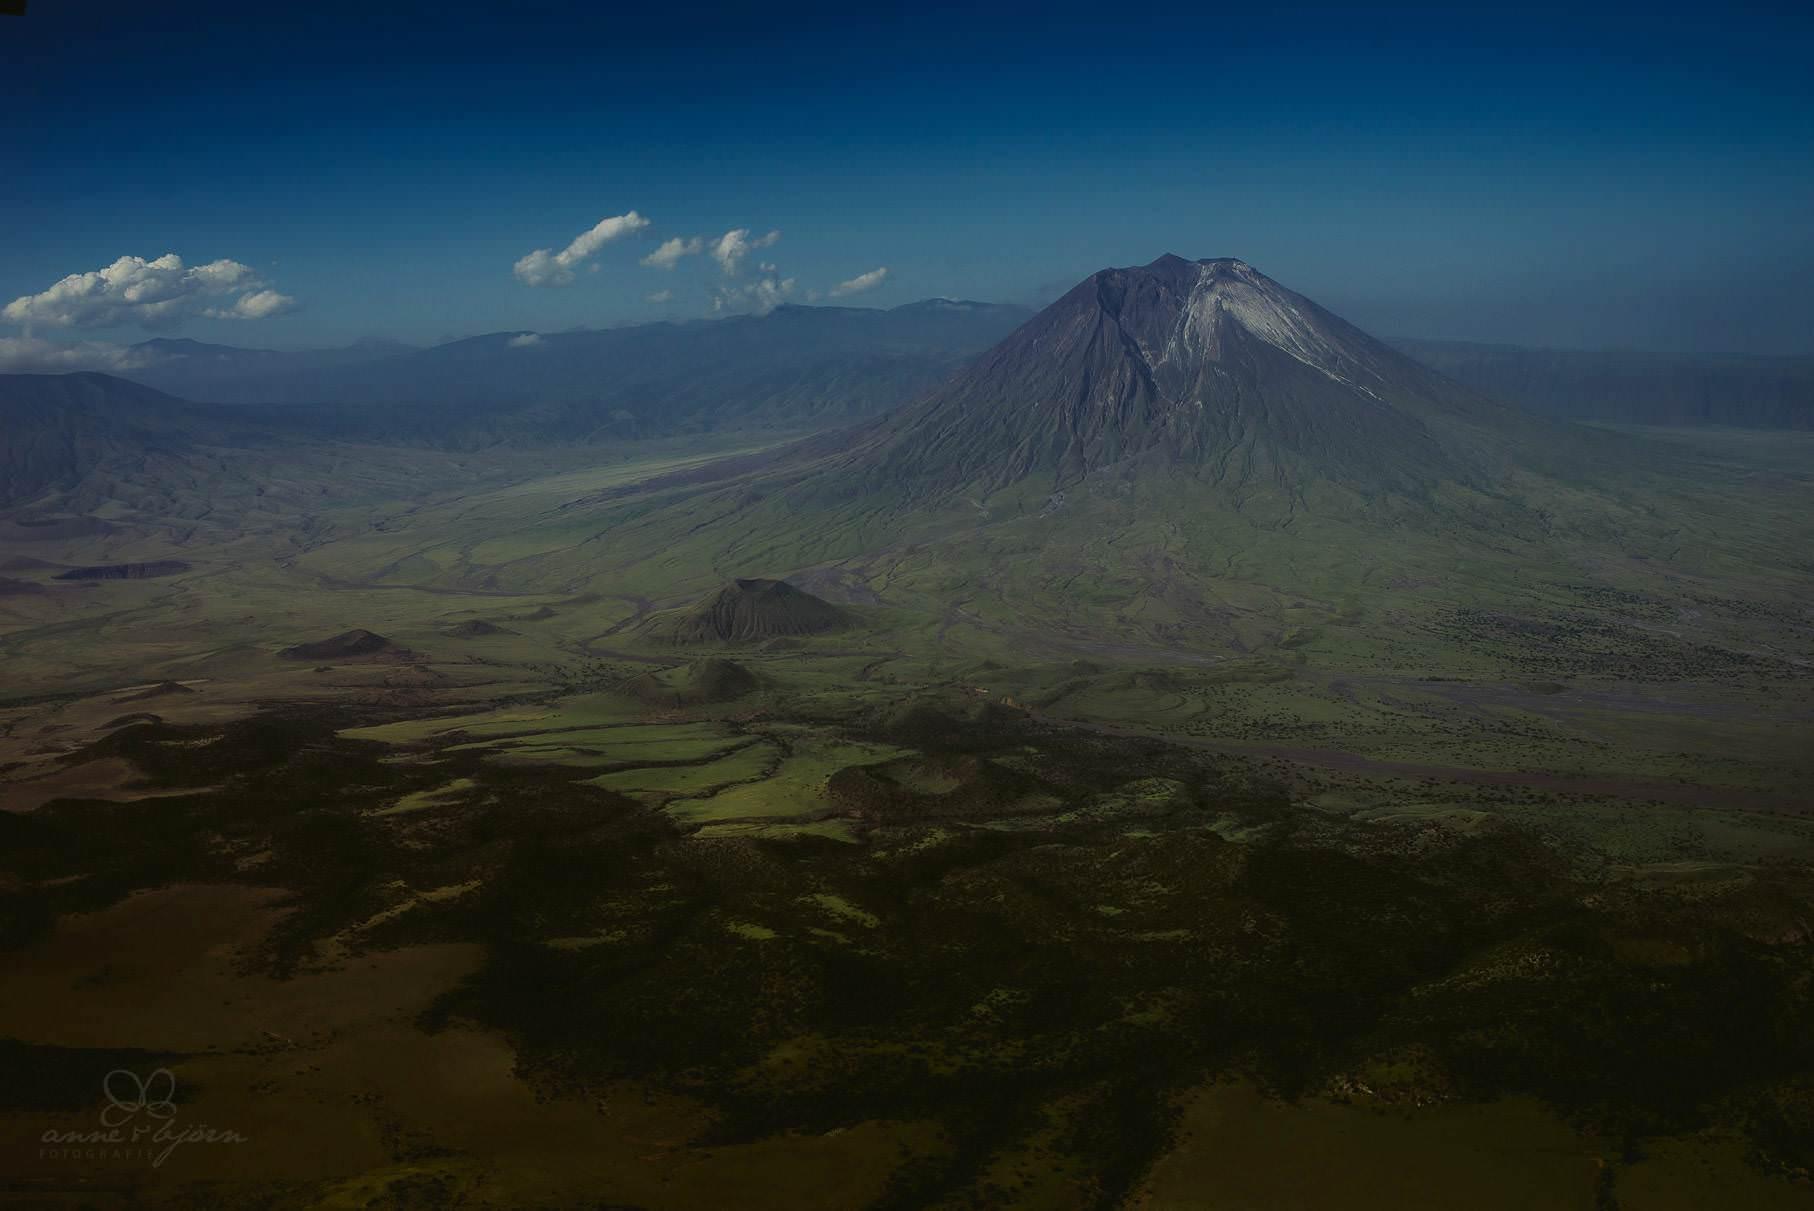 0003 tansania nd6 5952 anne bjoern fotografie hochzeitsfotograf hamburg - This is Tanzania - Serengeti, Kilimanjaro & Sansibar